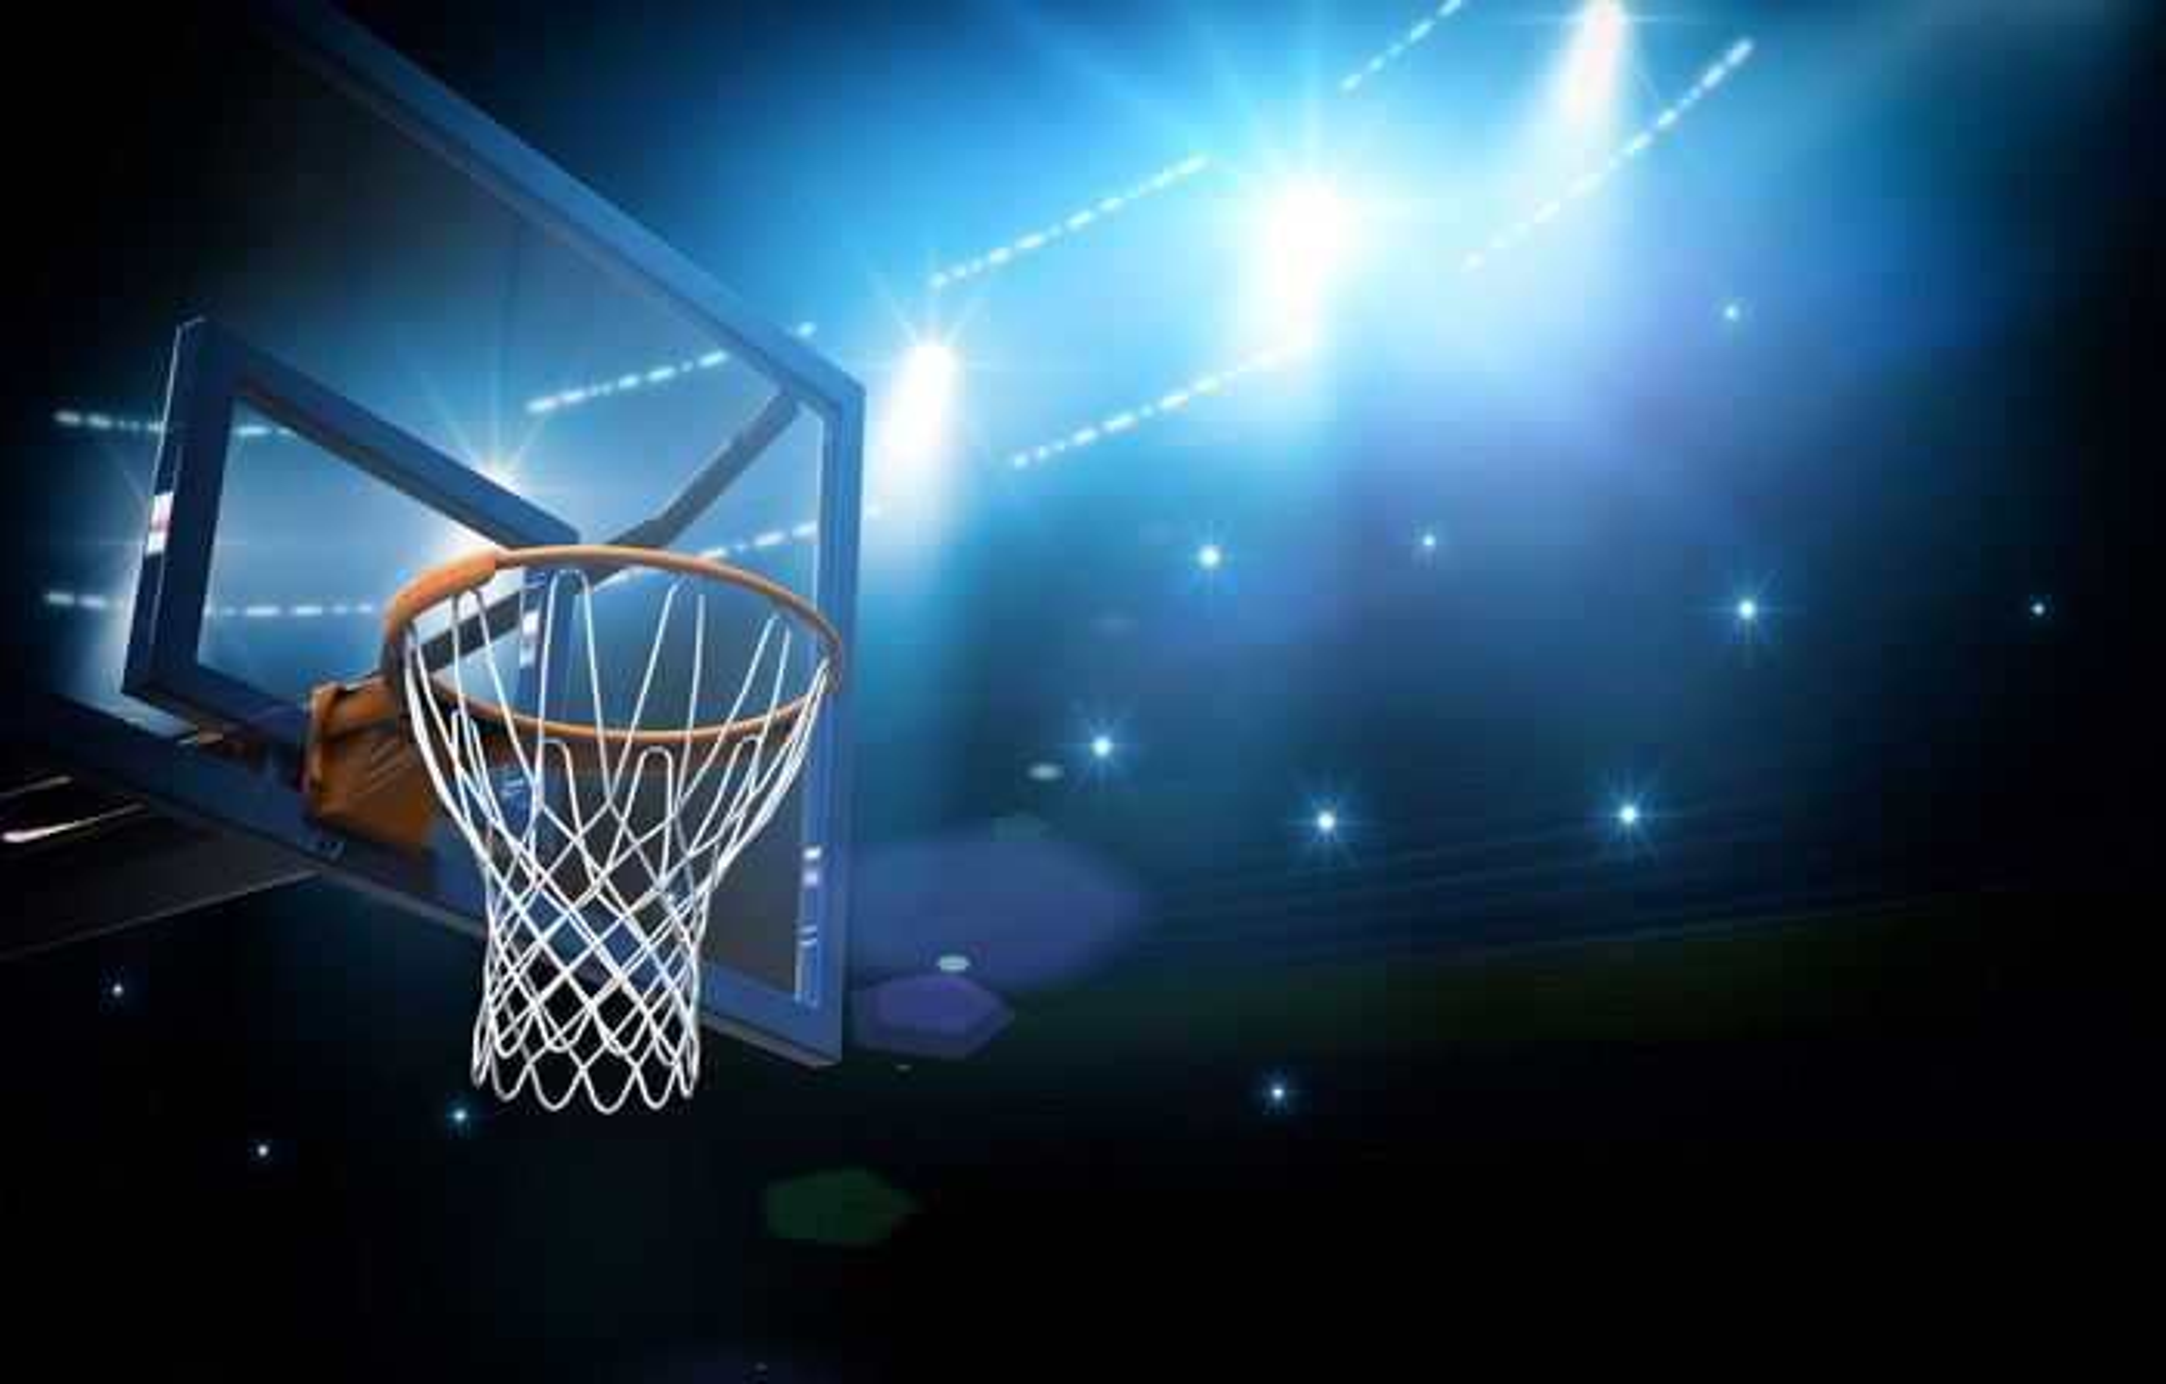 Basketball hoop in arena.